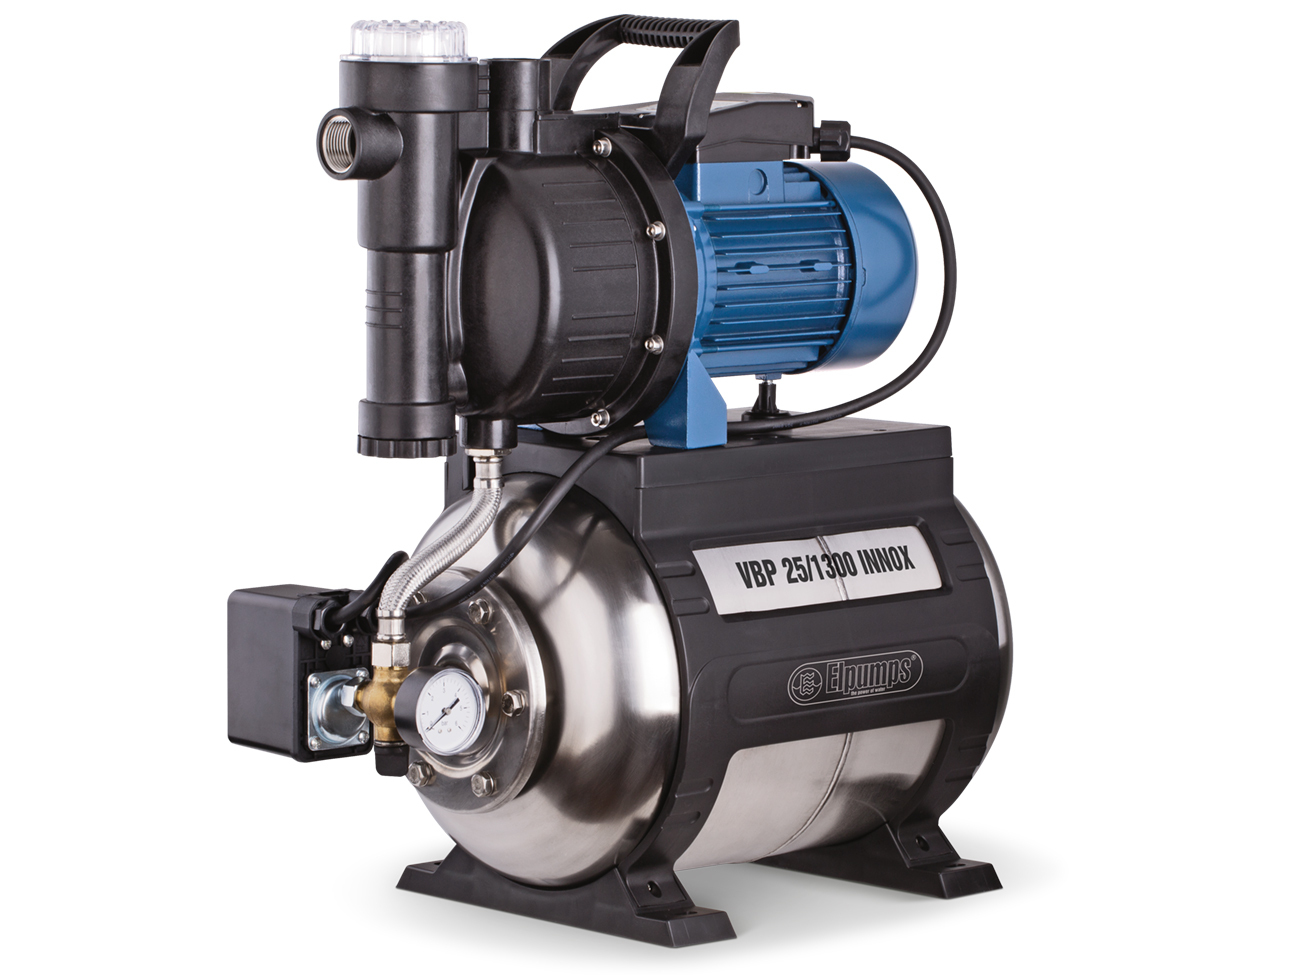 VBP 25/1300 INOX - domácí vodárna